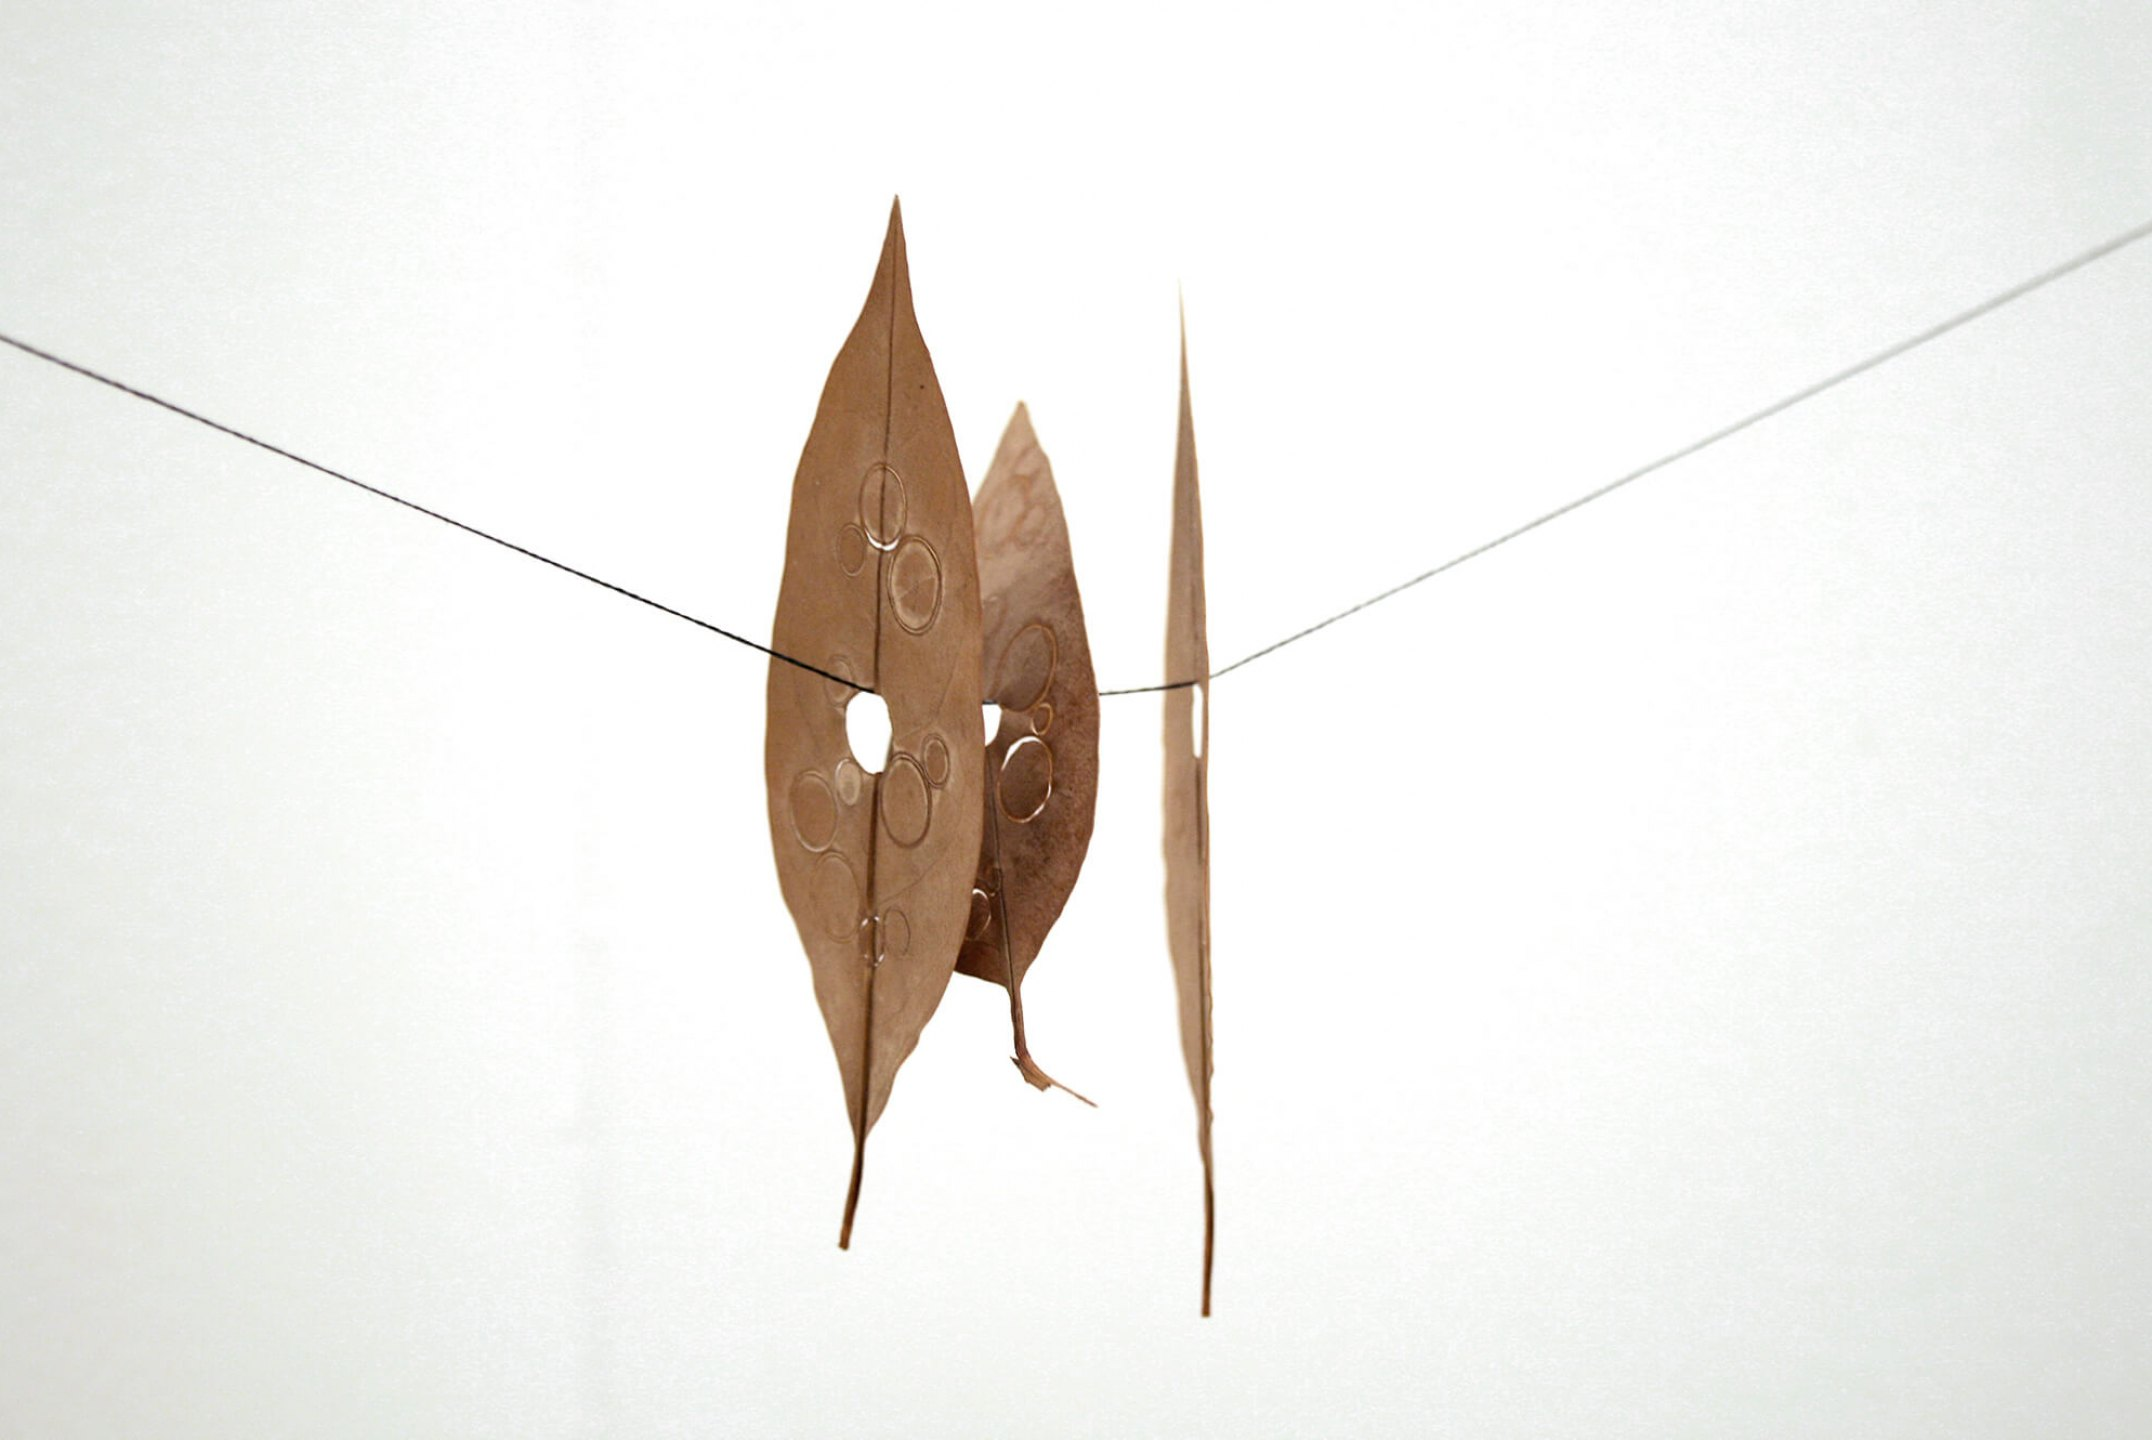 Daniel Steegmann Mangrané, <em>Fura folhas</em>, 2001,&nbsp;ficus elastica japonicum leaves printed and dehydrated, silk thread,&nbsp;10 x 3,5 cm / 8 x 3,5 cm / 10 x 3,5 cm - Mendes Wood DM